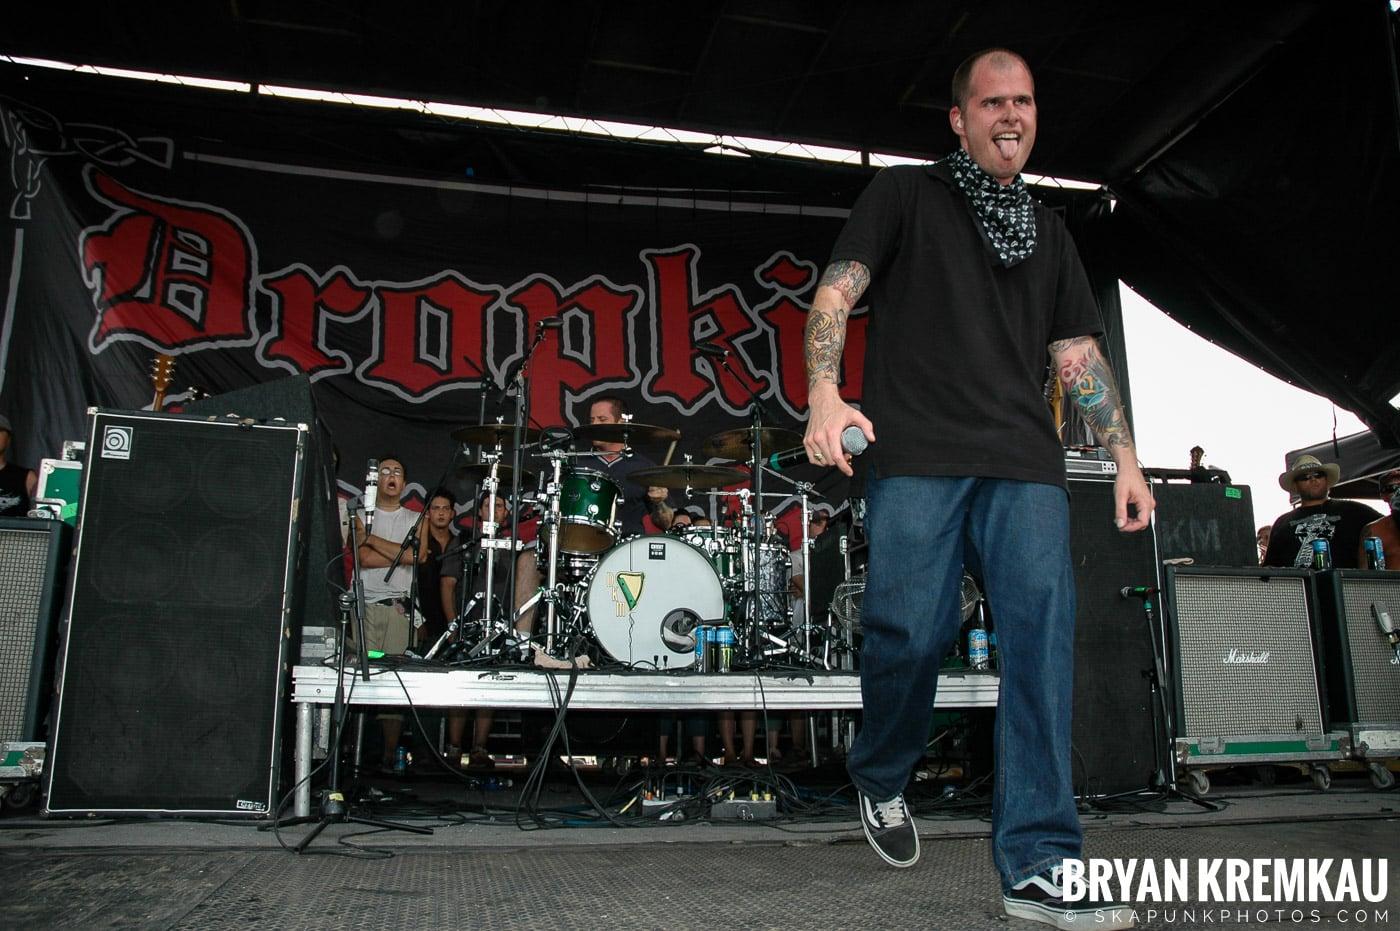 Dropkick Murphys @ Warped Tour 05, NYC - 8.12.05 (6)